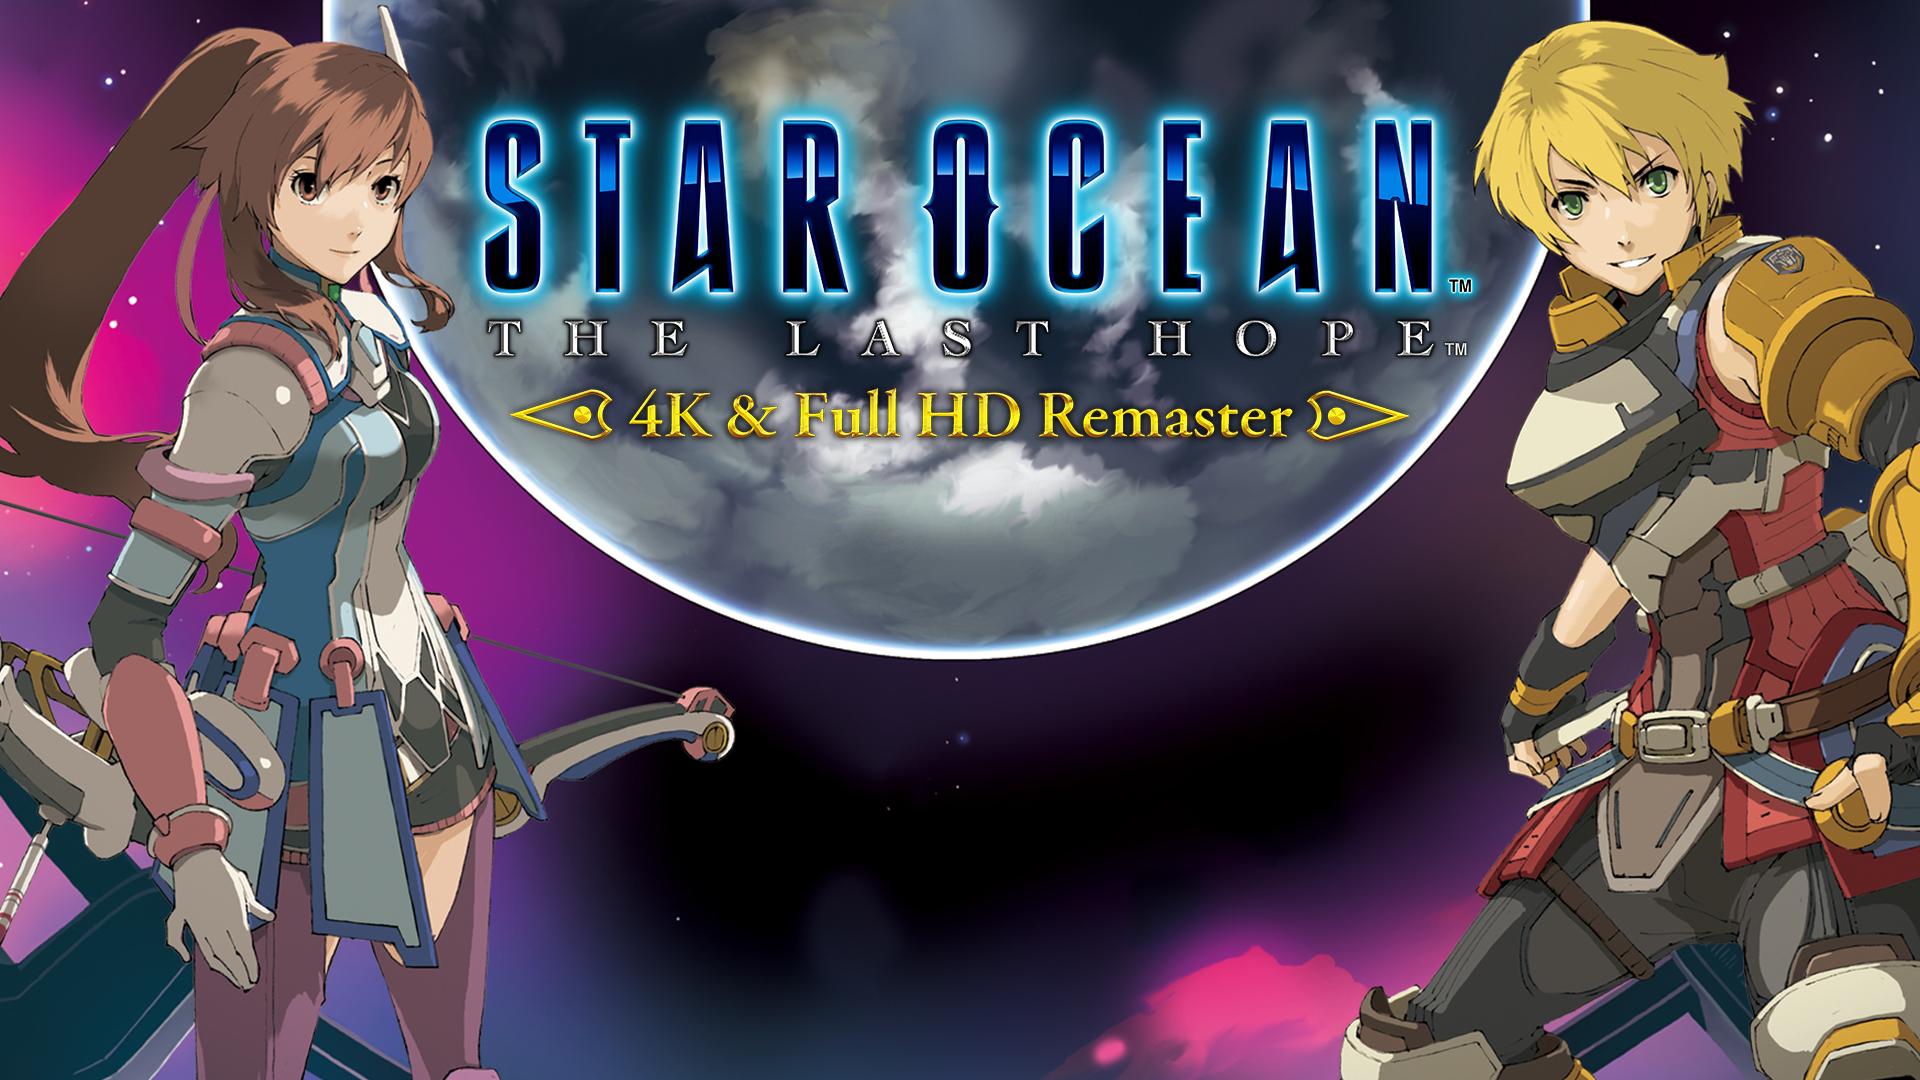 STAR OCEAN - THE LAST HOPE - 4K & Full HD Remaster [Online Game Code] (Star Ocean The Last Hope Side Quests)